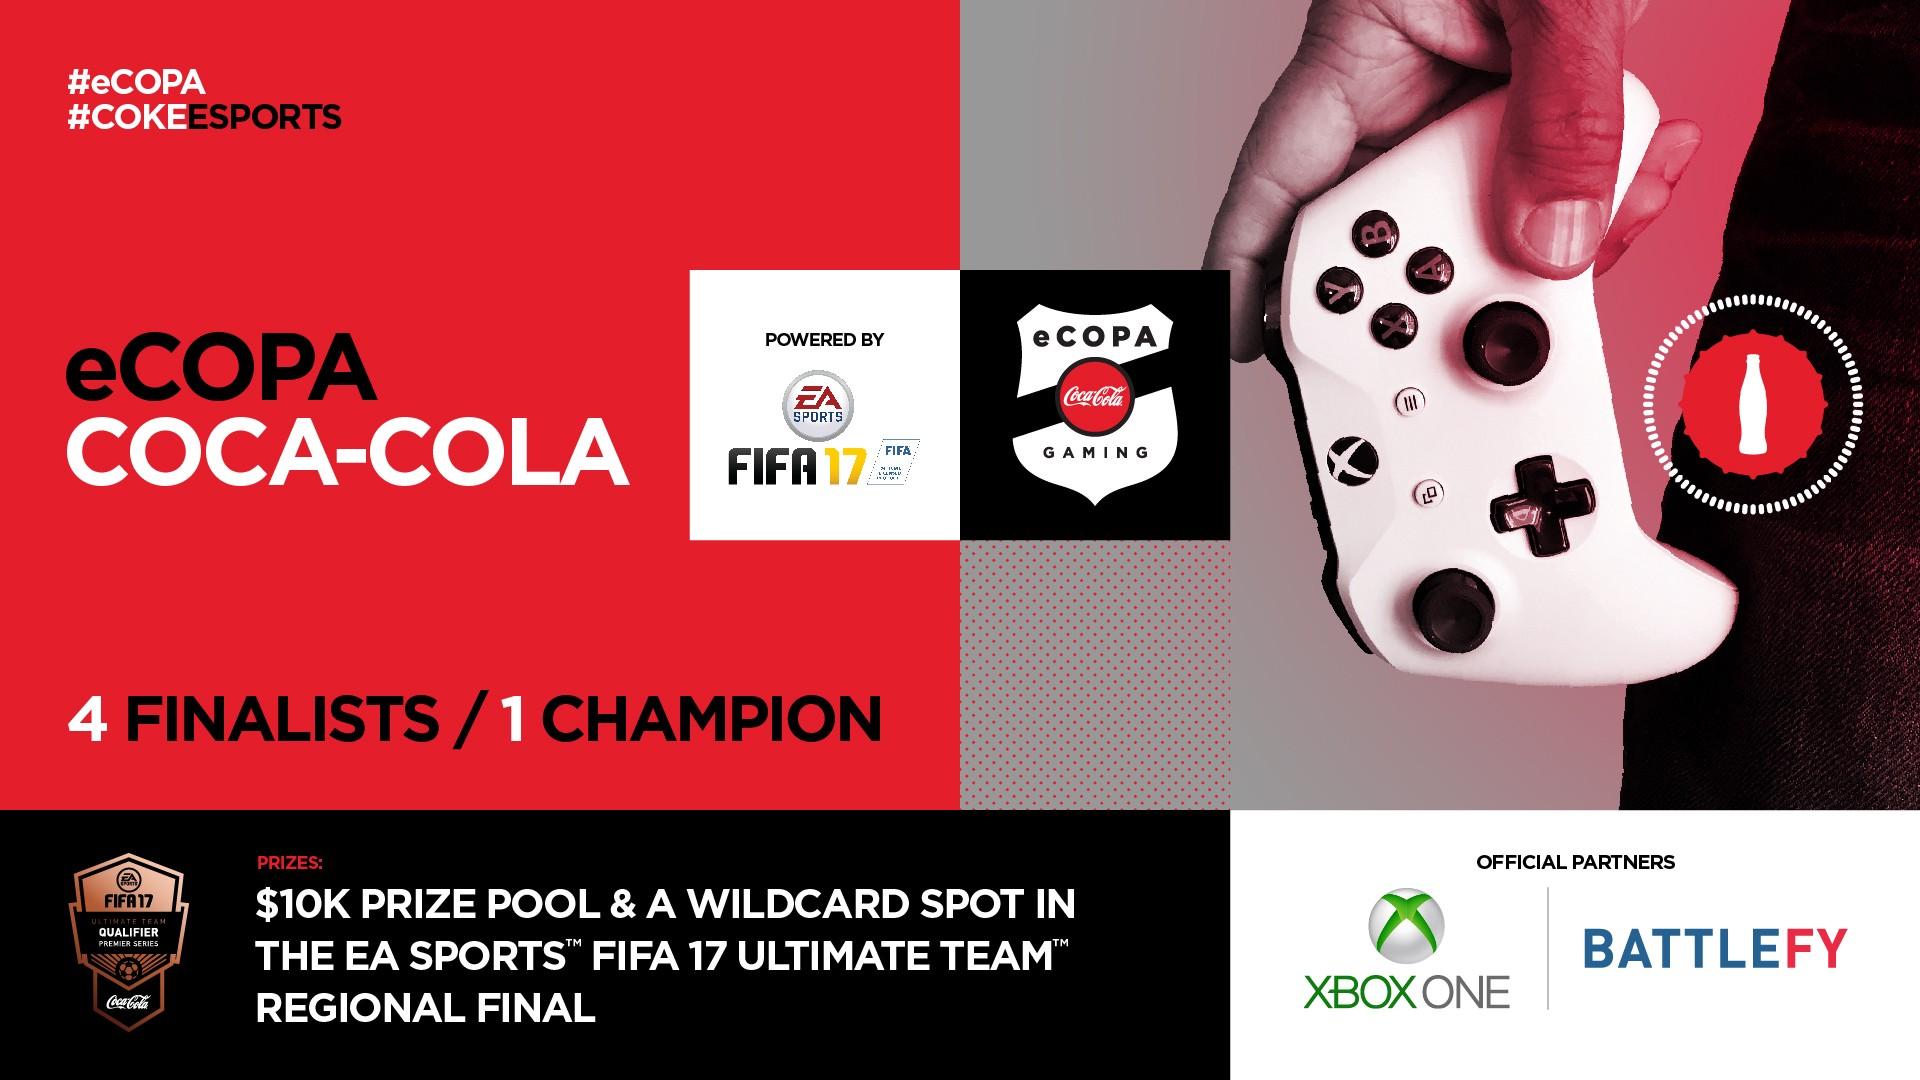 Coke eSports